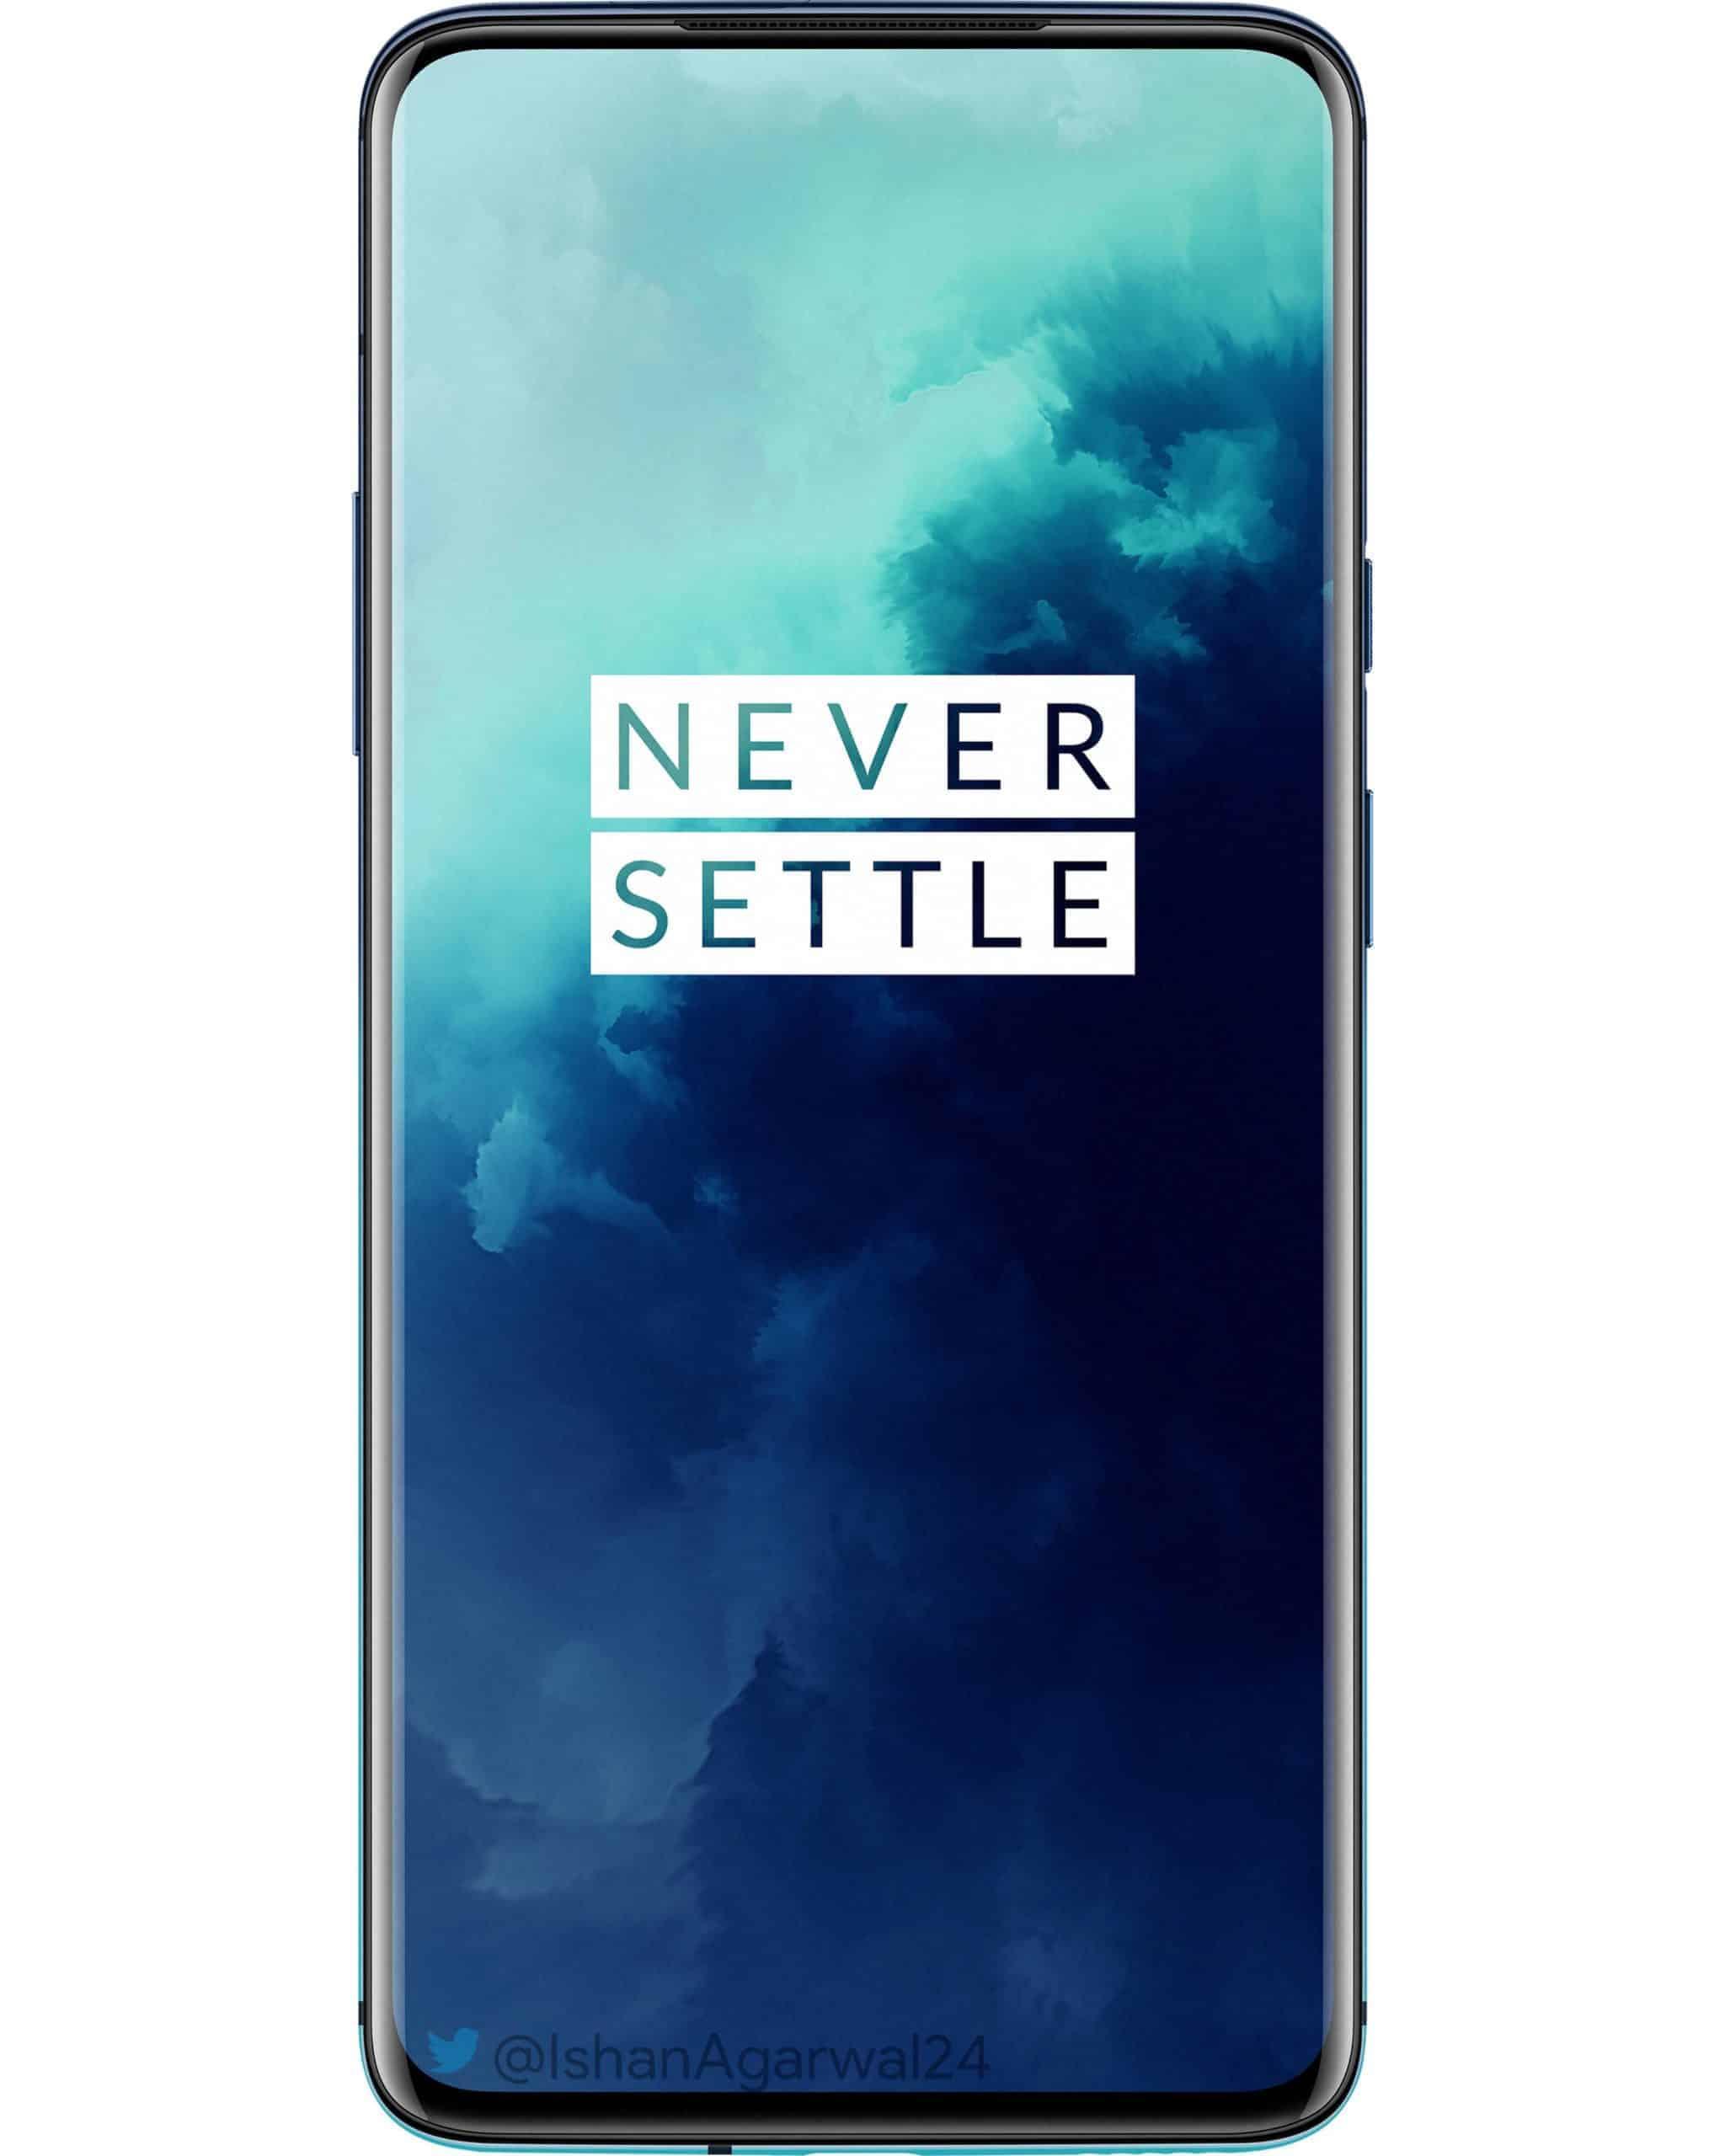 OnePlus 7T Pro Haze Blue official render leak 1